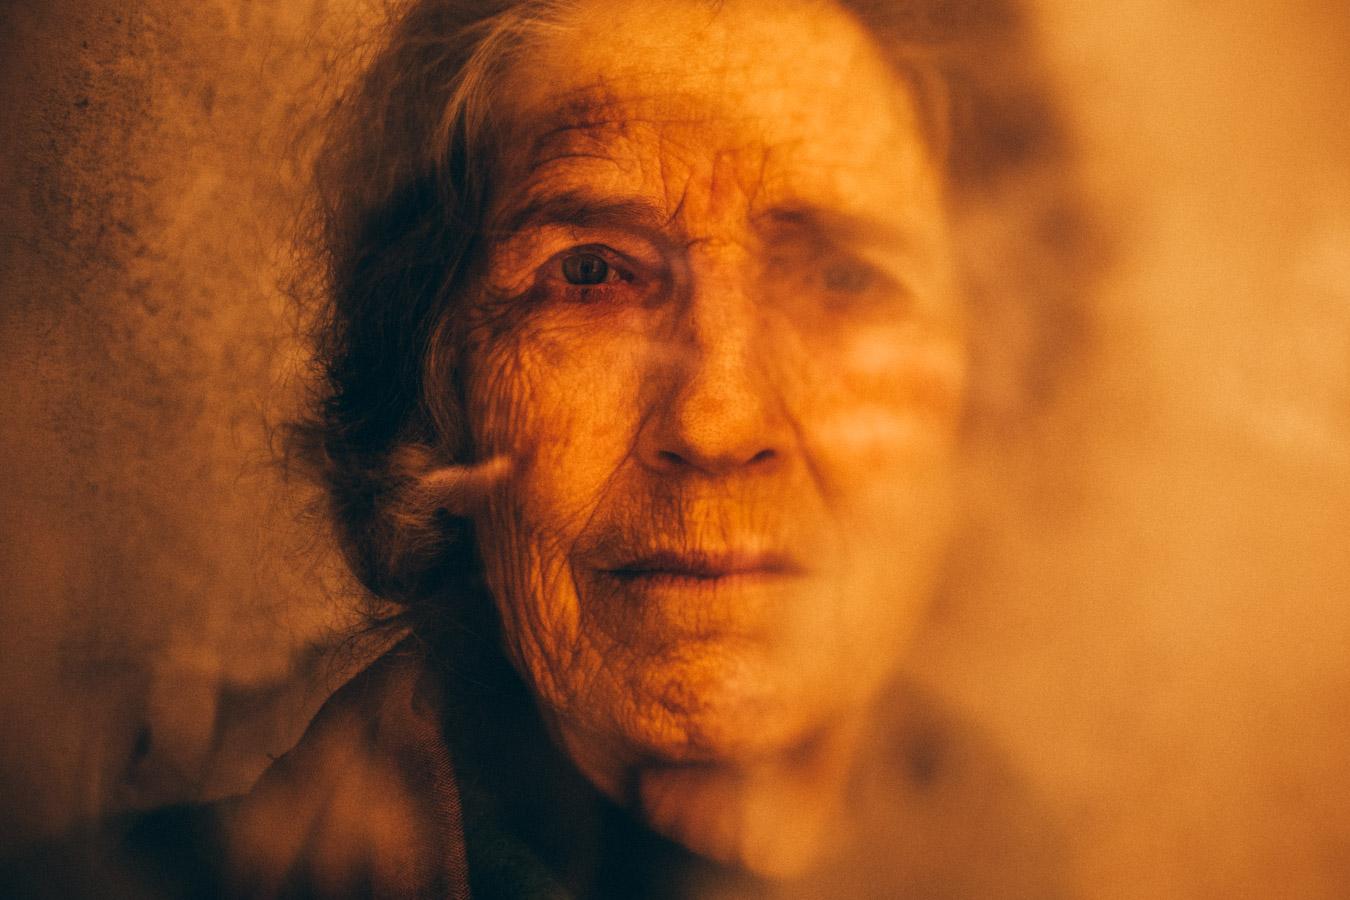 Editorial-Travel-Portraits-01-1.jpg